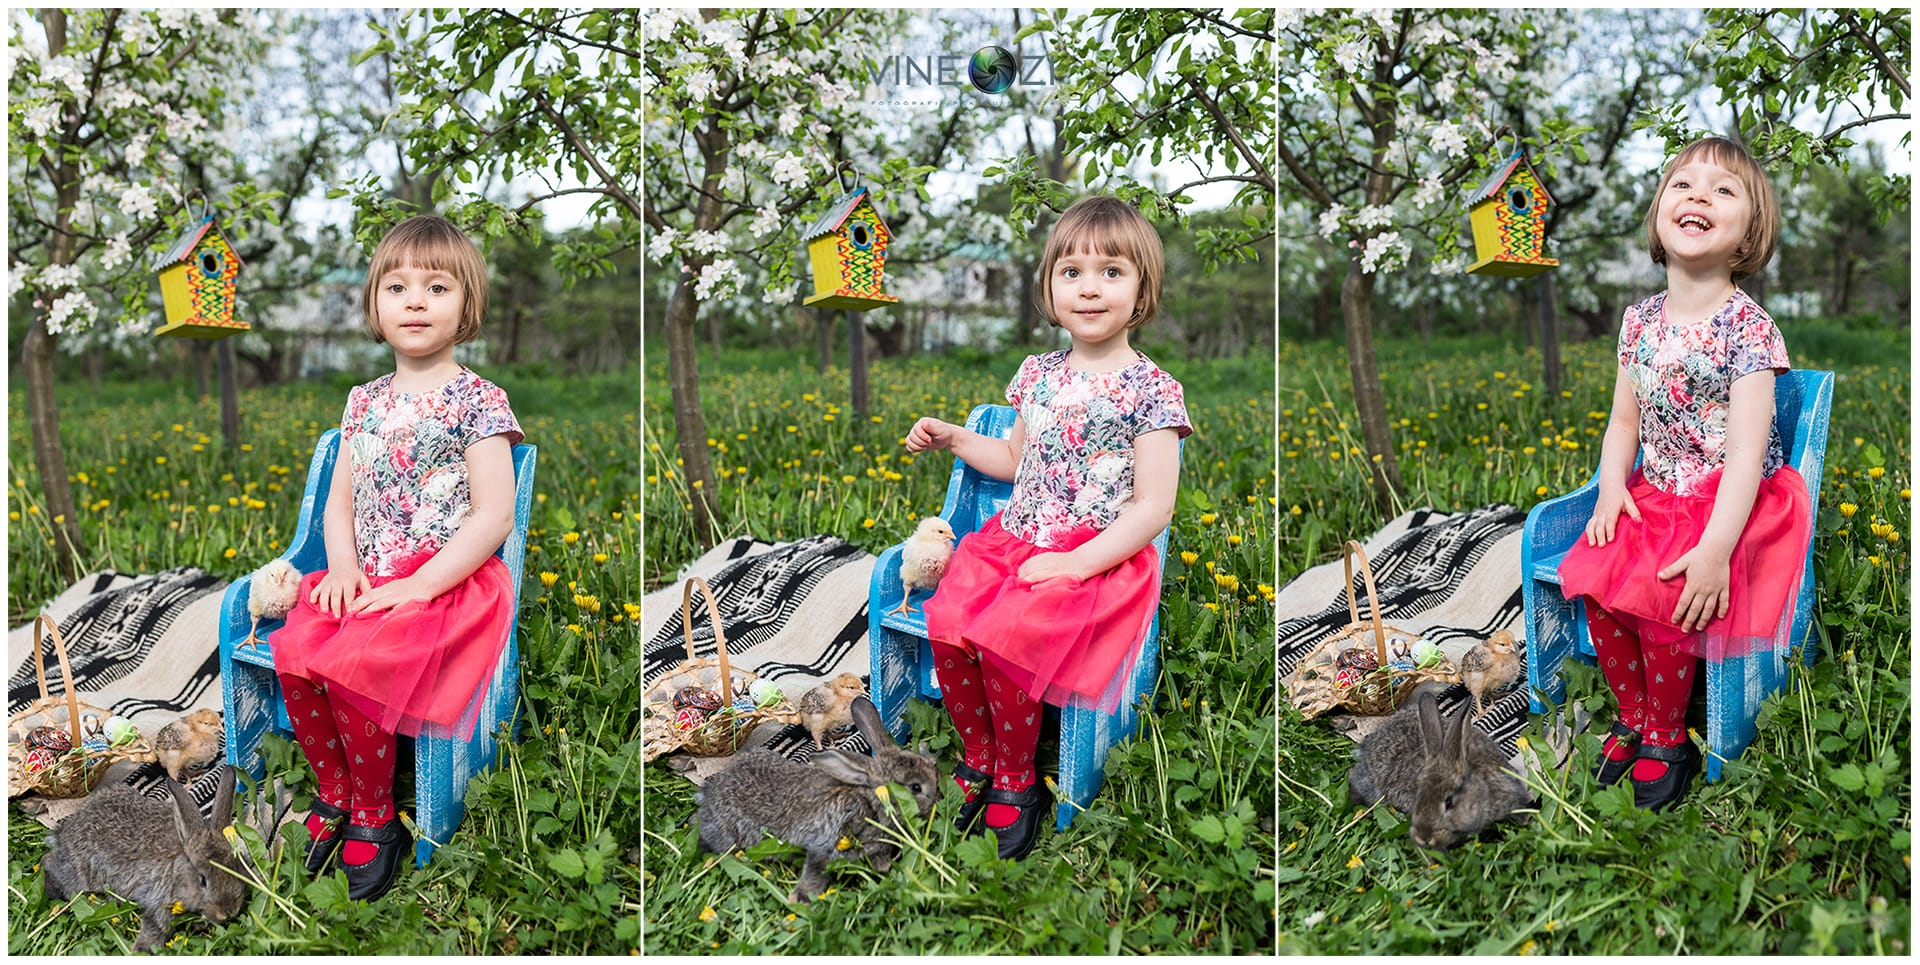 Olivia - Falticeni - aprilie 2016 © Codrin Anton FOTOGRAF – www.VineOZi.ro